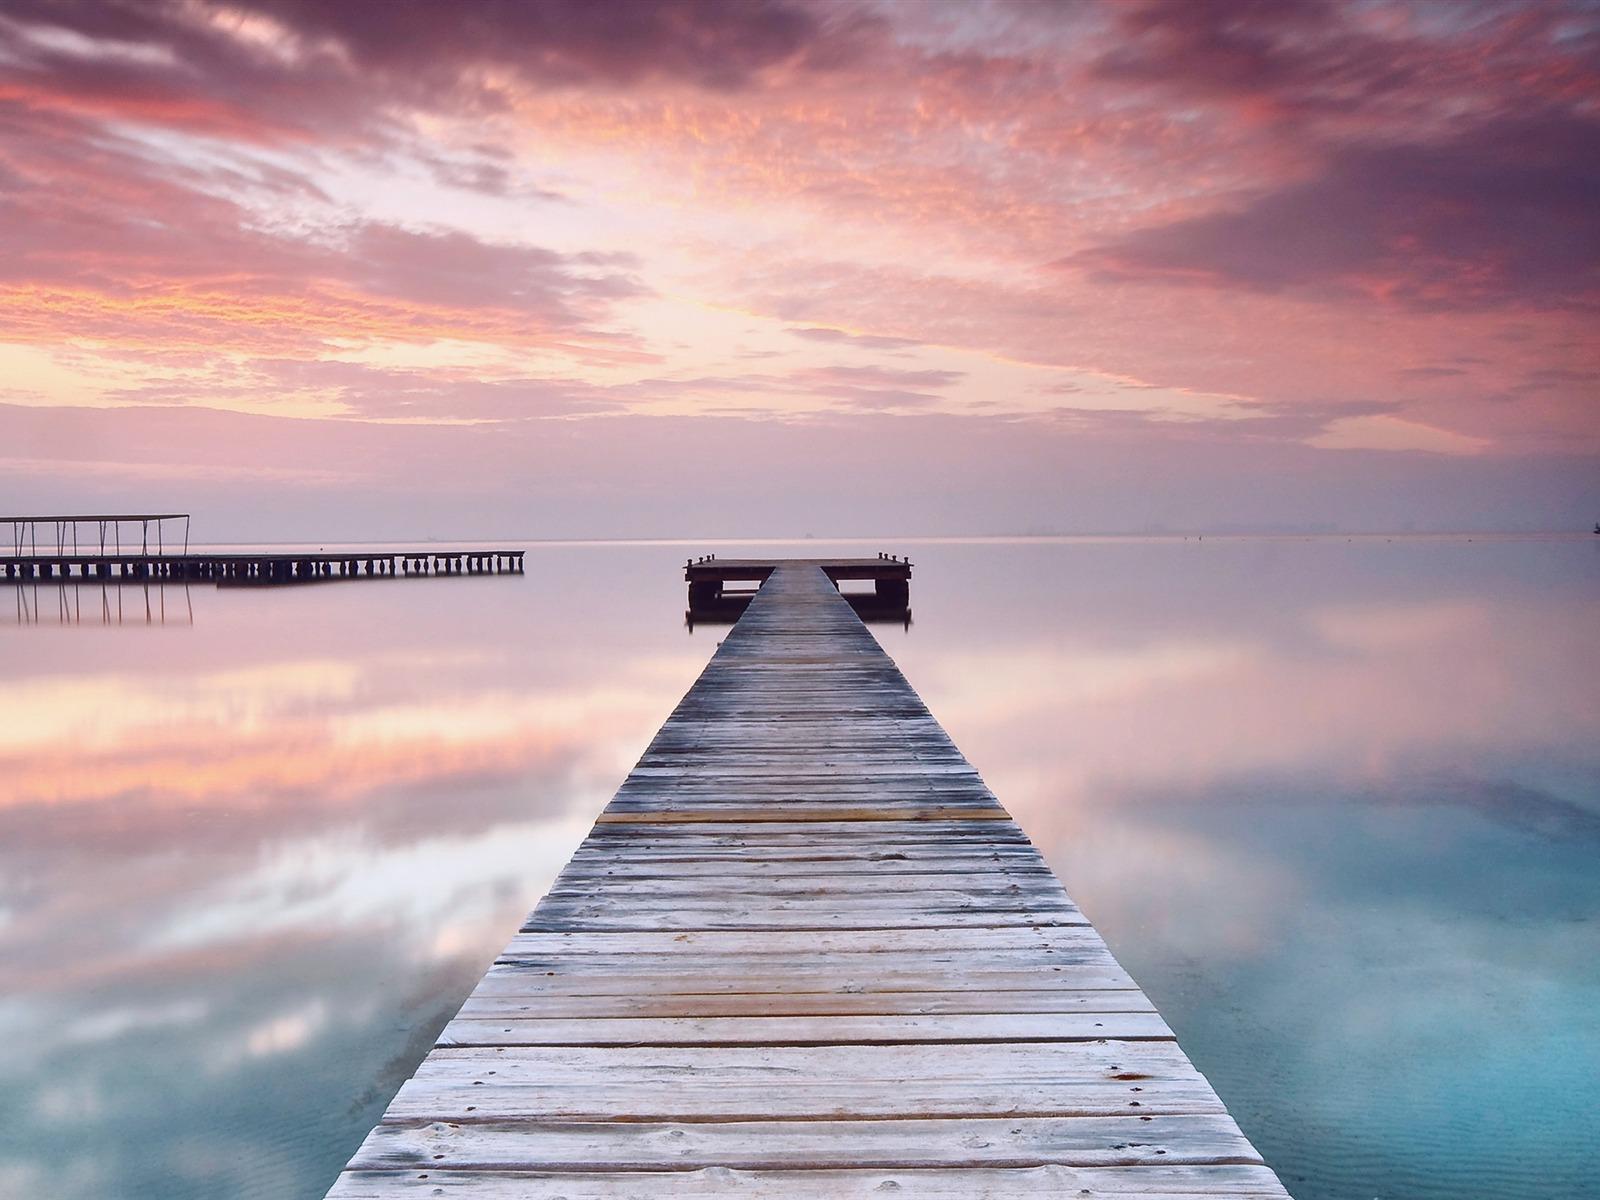 Espagne ciel rose nuage pont océan-2017 Paysage Fond d'écran Aperçu | 10wallpaper.com